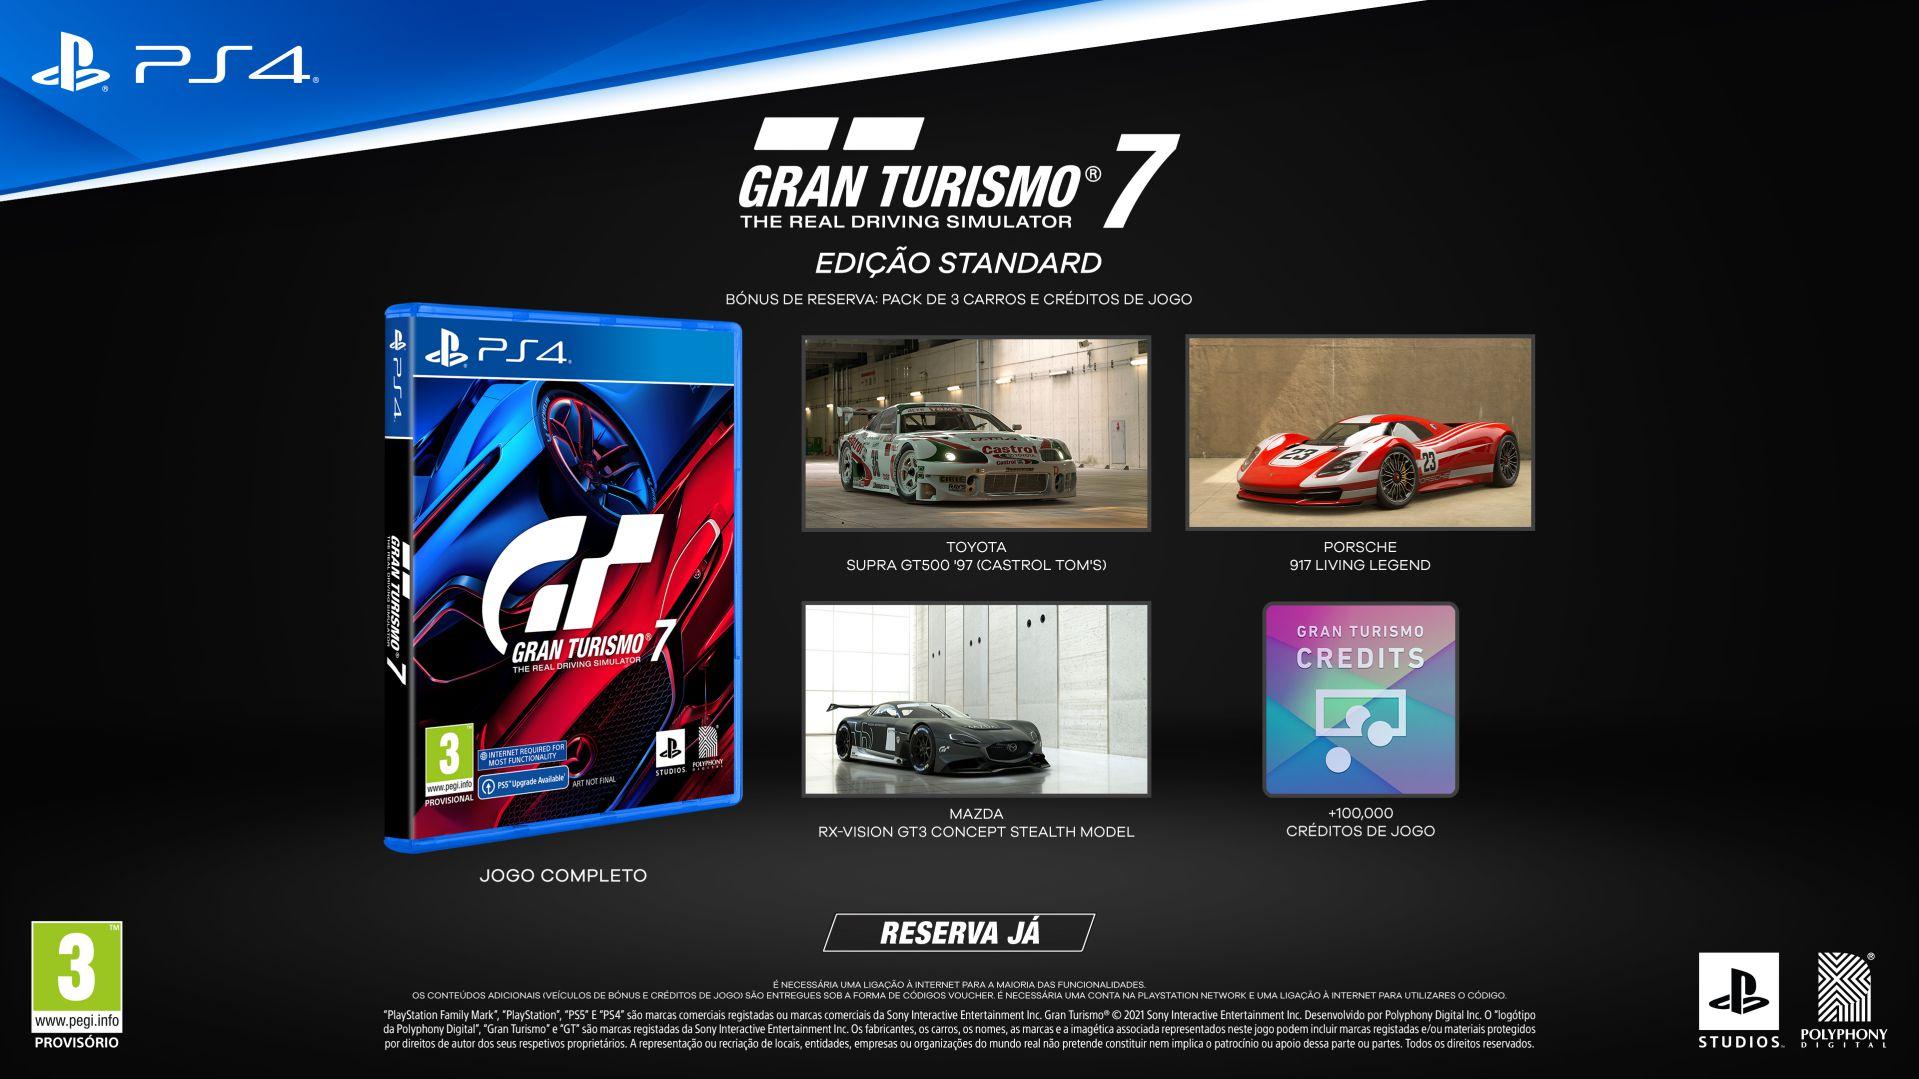 Gran Turismo 7 PS4.jpg